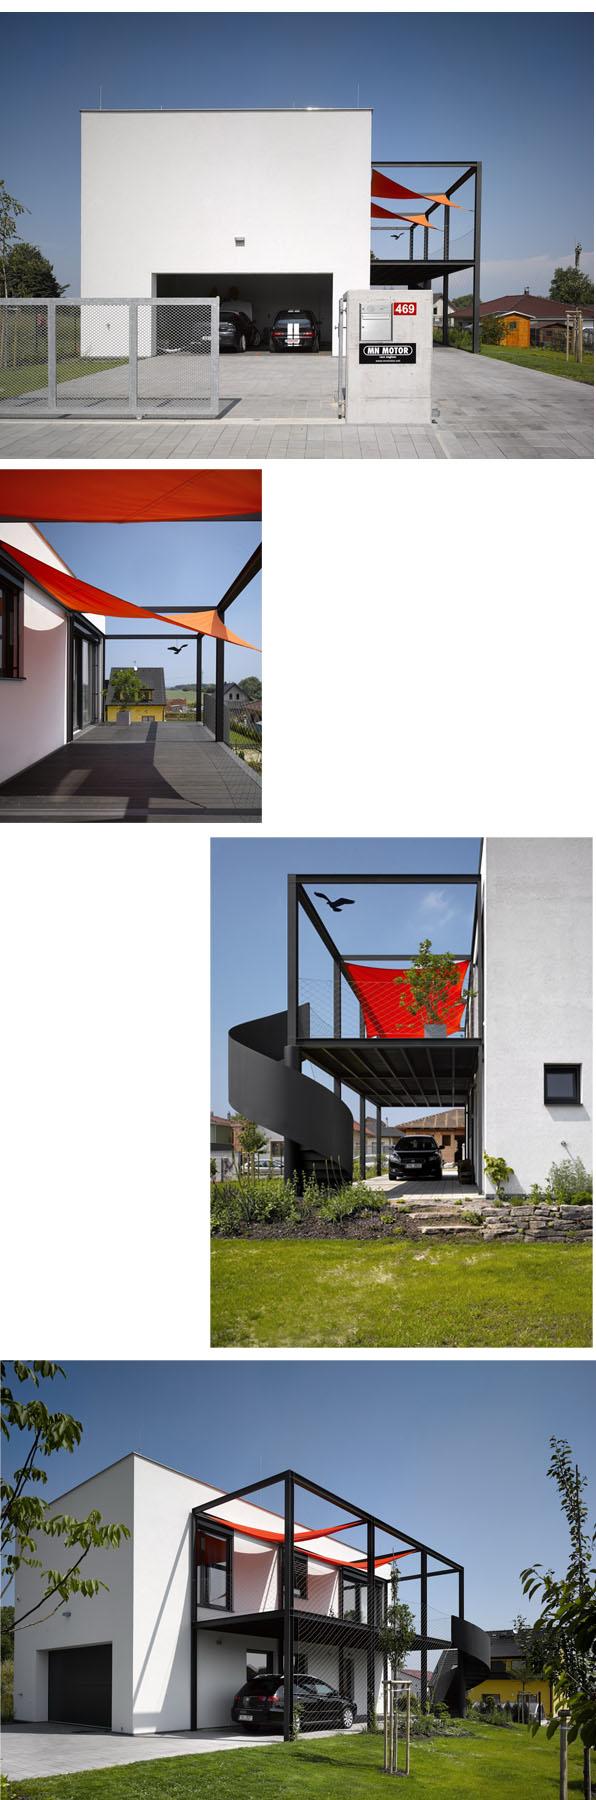 stempel tesar family driver house modus vivendi arquitectura modular prefab architecture design diseño